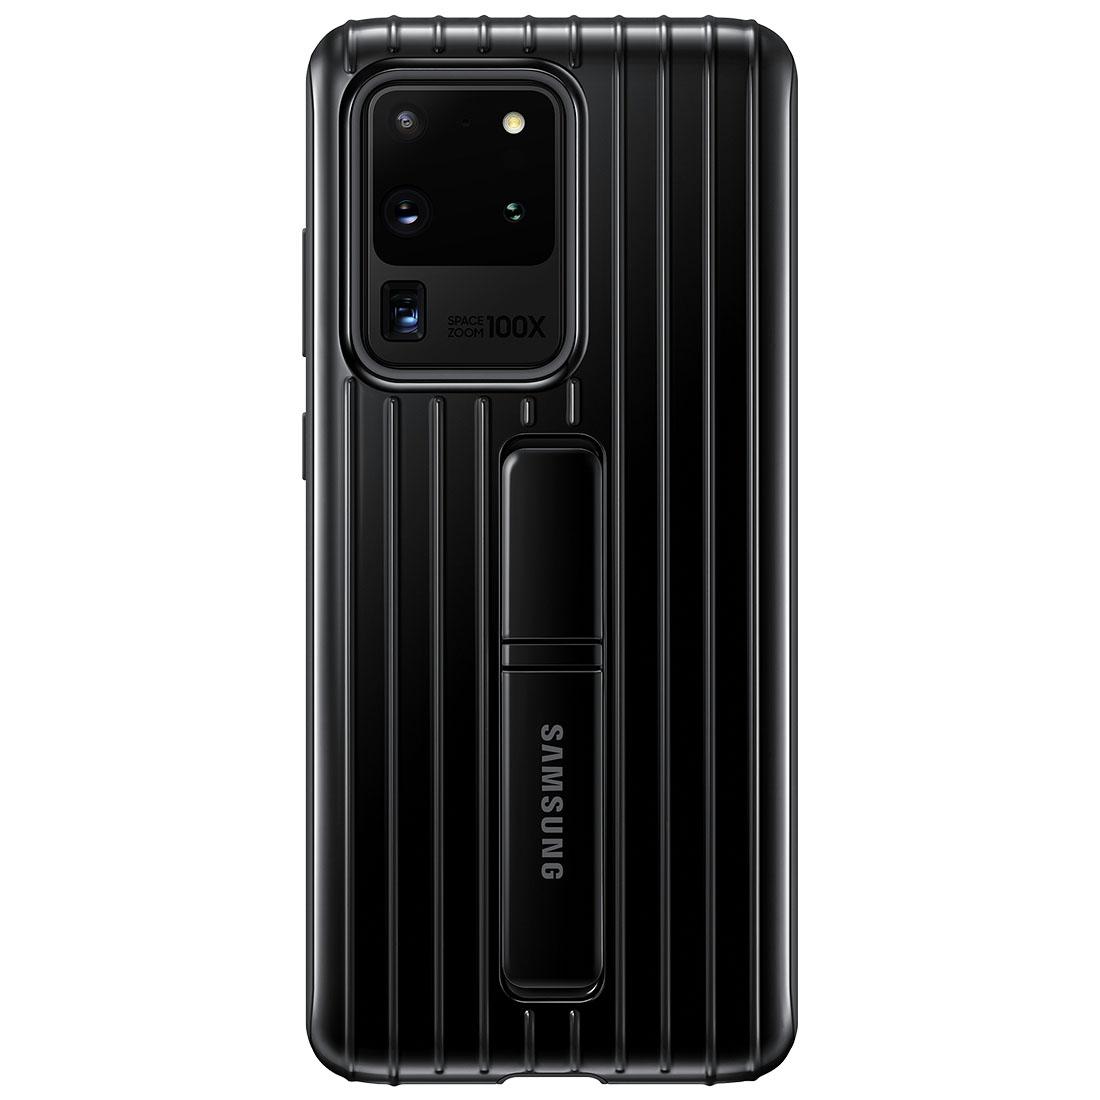 Capa Original Samsung Protective Standing Galaxy S20 Ultra 6.9 Pol G988